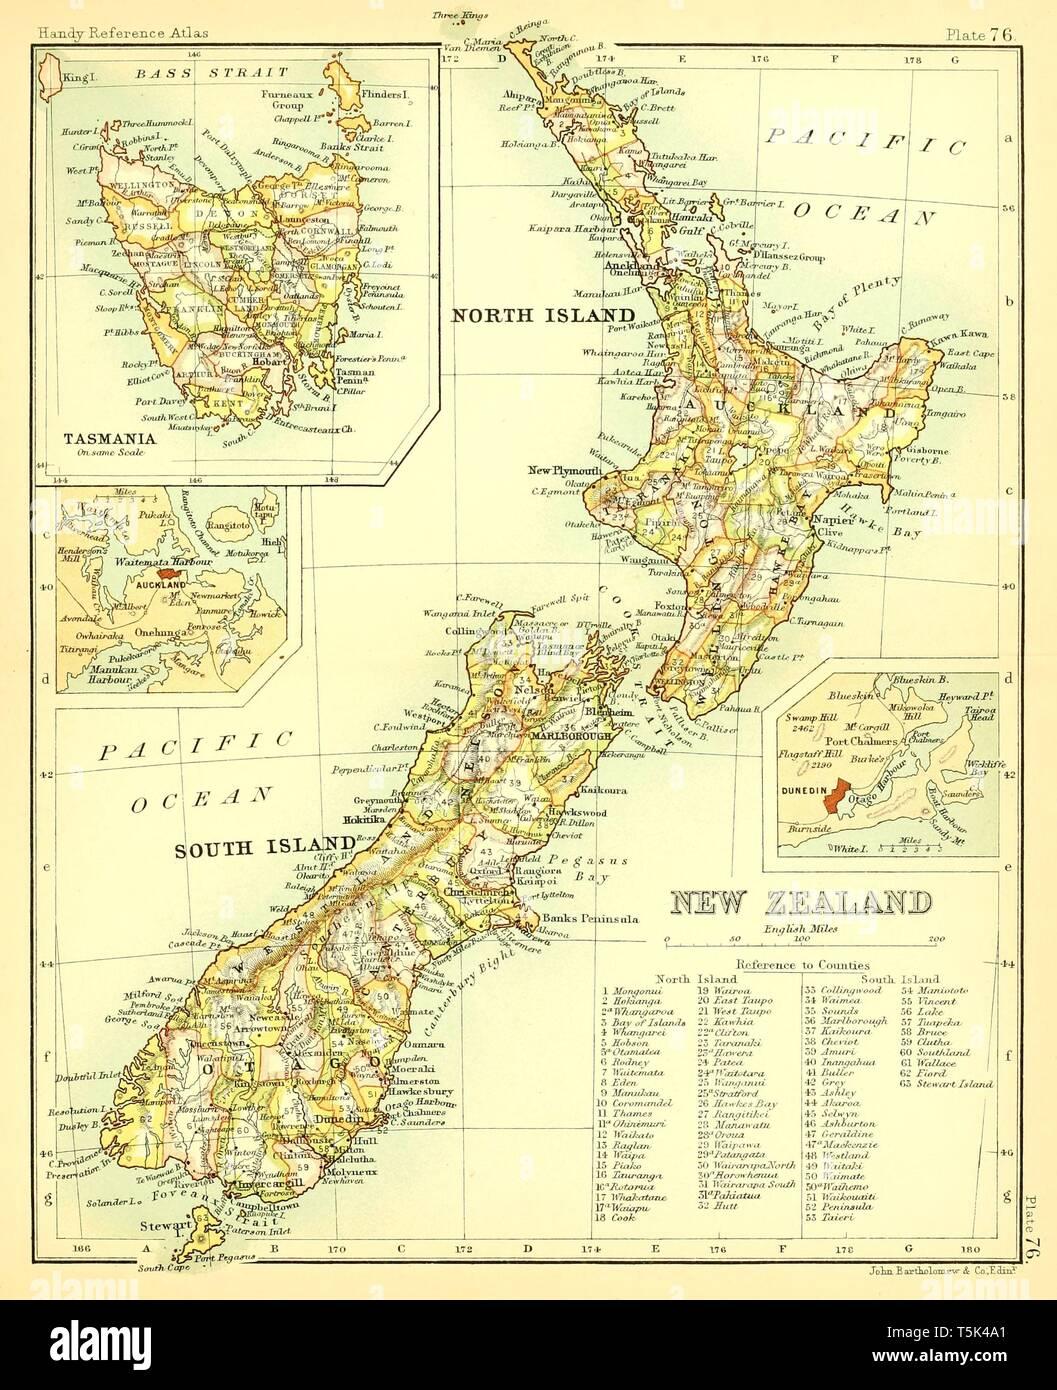 Karte Neuseeland Südinsel Zum Ausdrucken.New Zealand Map Stockfotos New Zealand Map Bilder Seite 3 Alamy